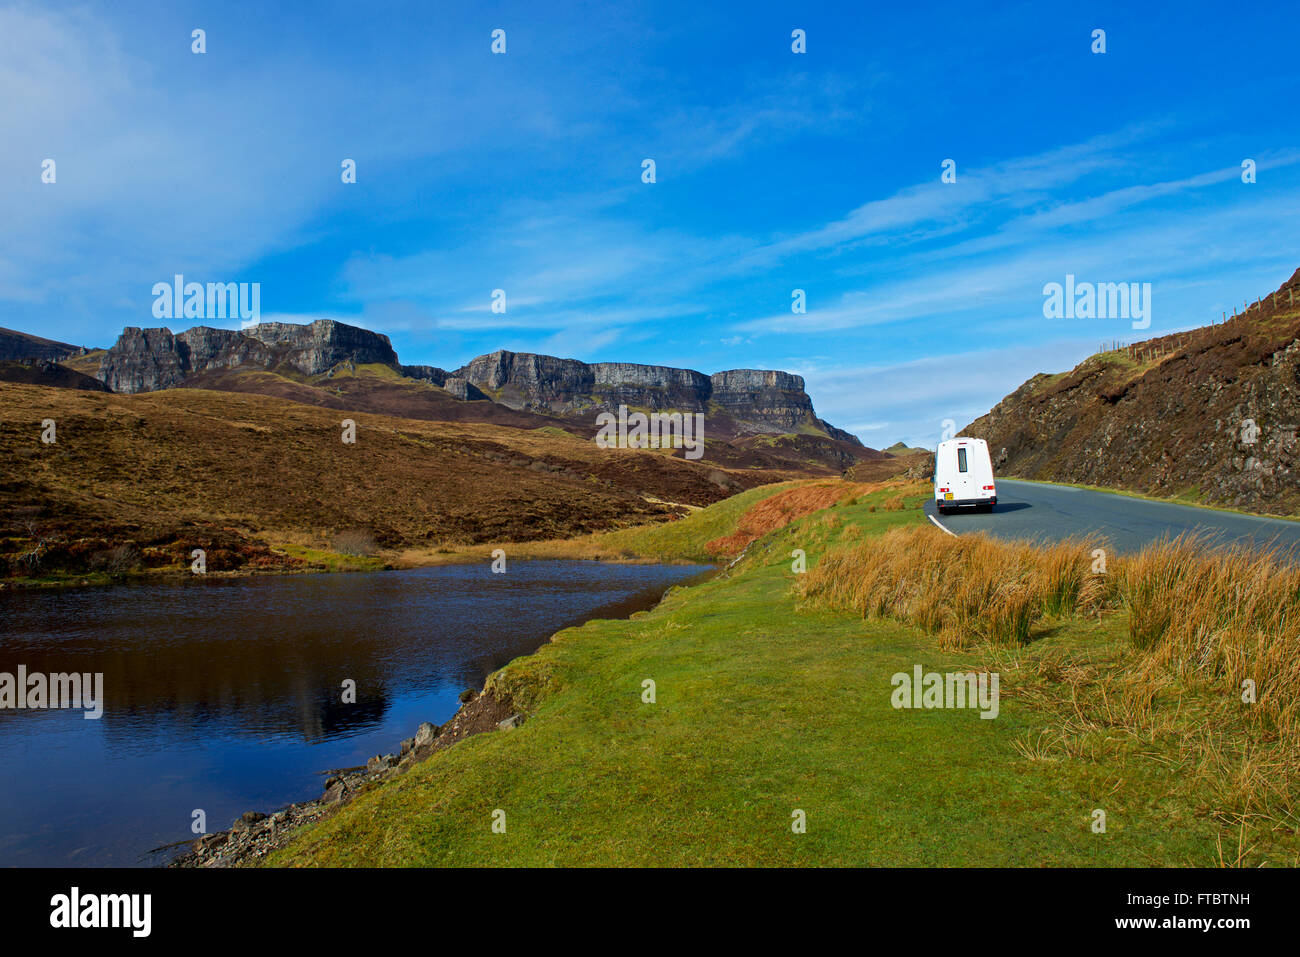 Small motorhome parked next to Lochan near Brogaig, Isle of Skye, Inner Hebrides, Scotland UK - Stock Image